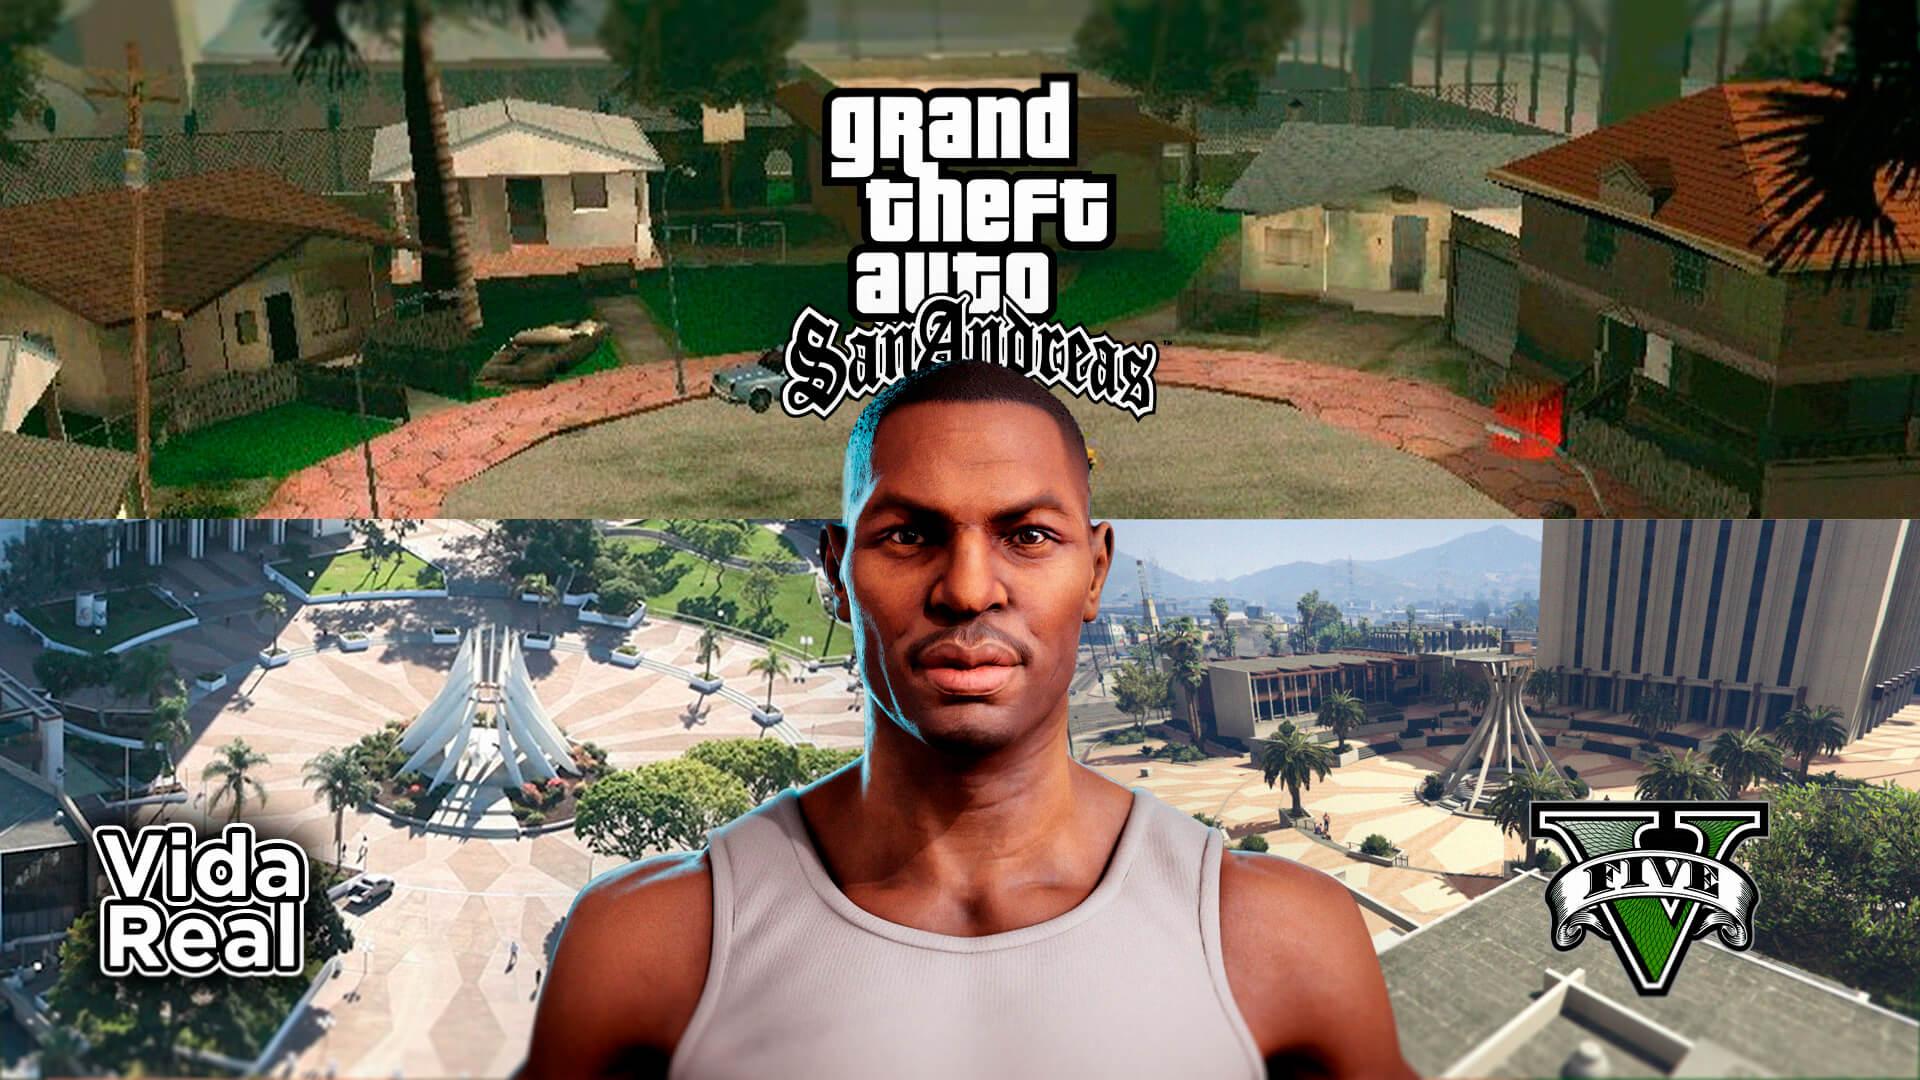 GTA San Andreas | Conheça a cidade onde CJ viveu na vida real 1